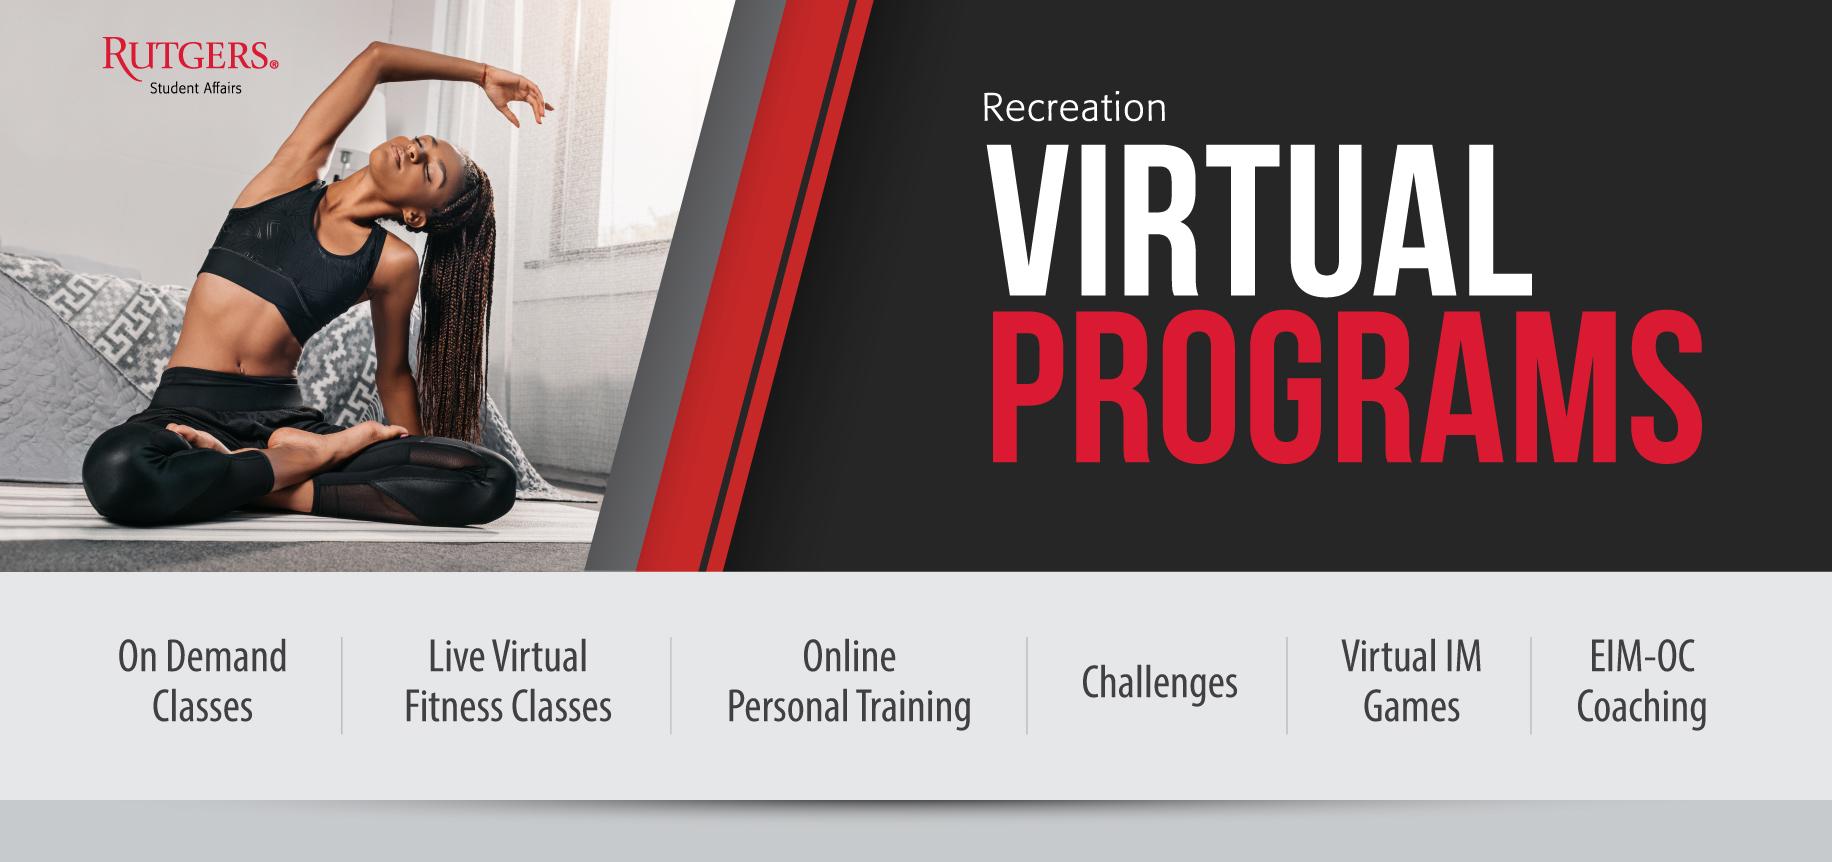 Rec_VirtualPrograms_V2_WebBanner_1832x862_S20_KP